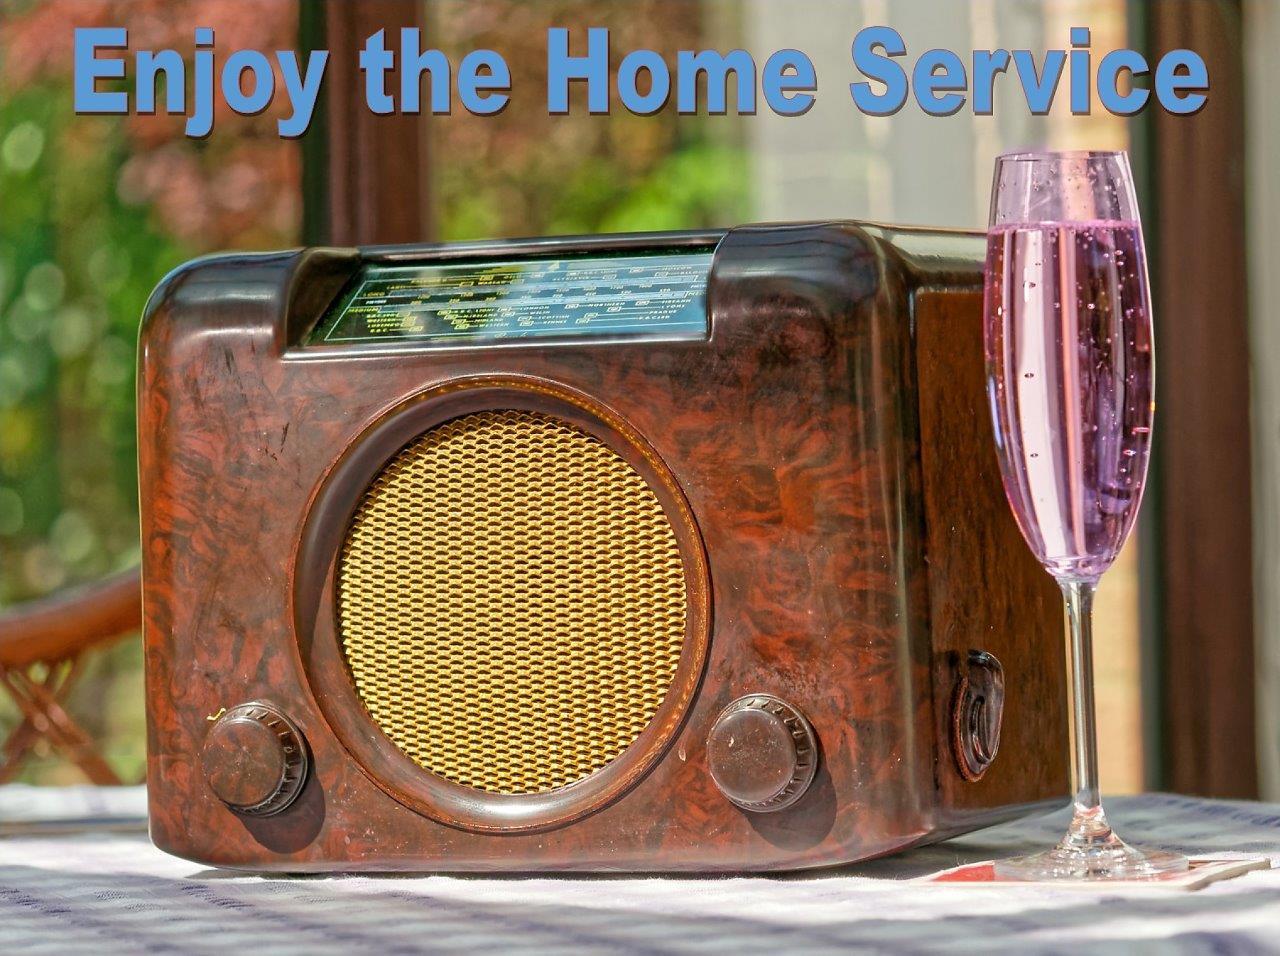 steve_home service_stayathome